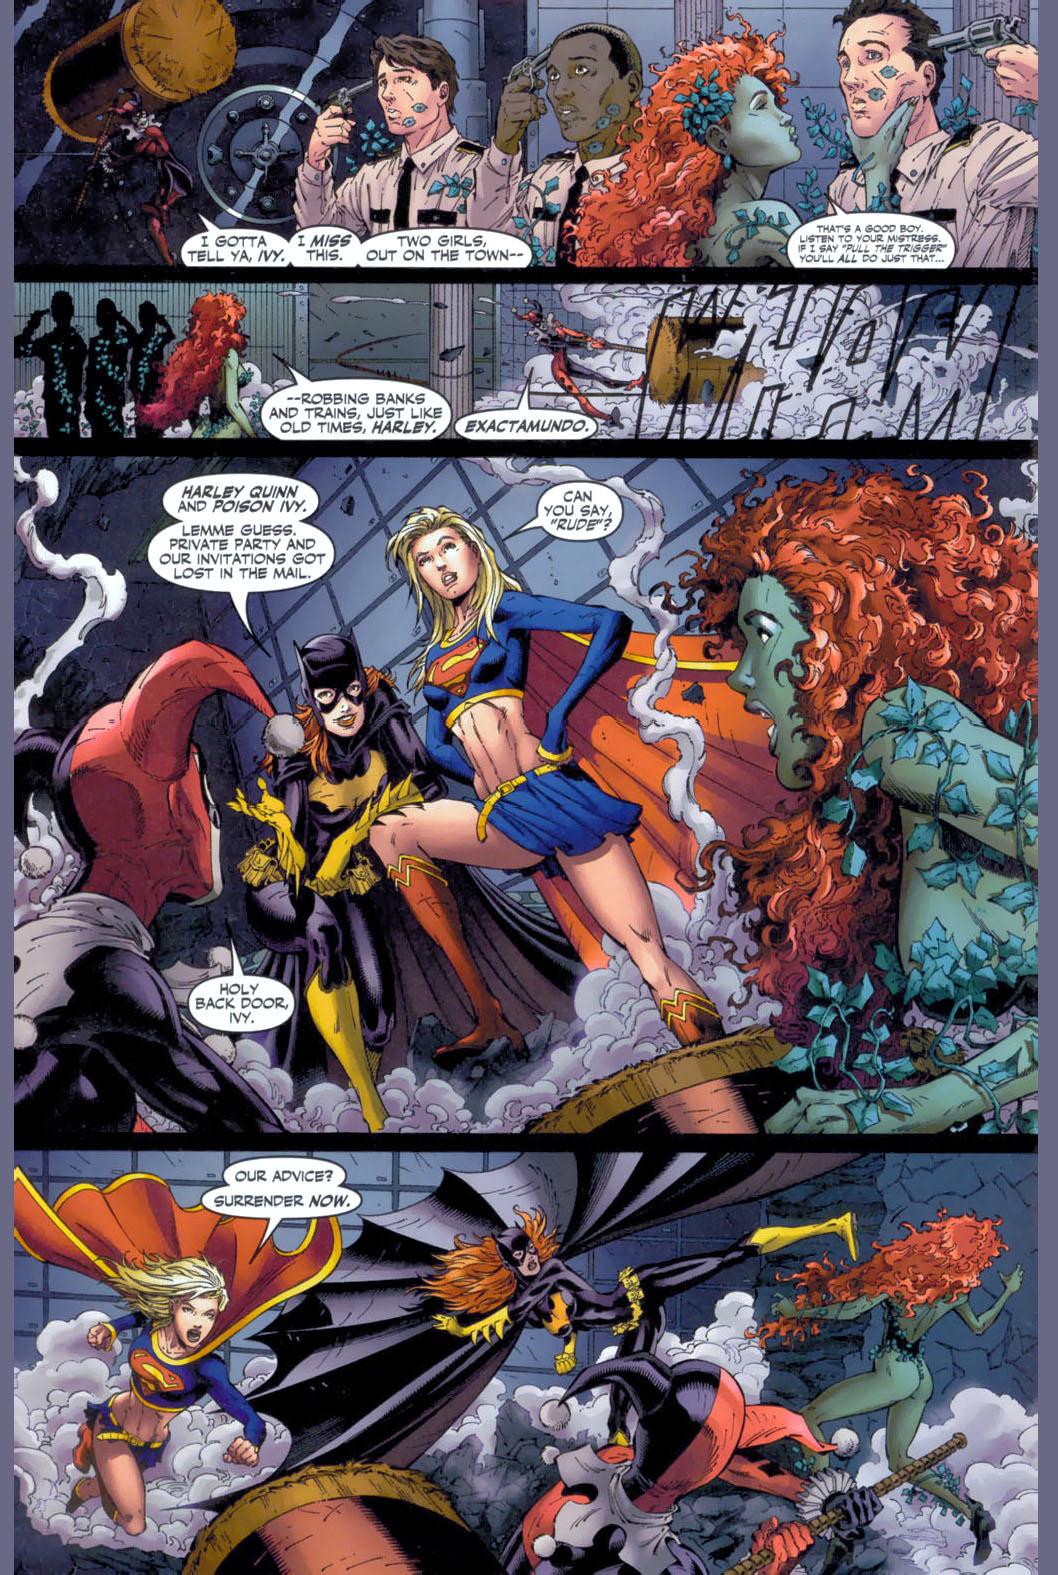 supergirl and batgirl vs harley quinn and poison ivy